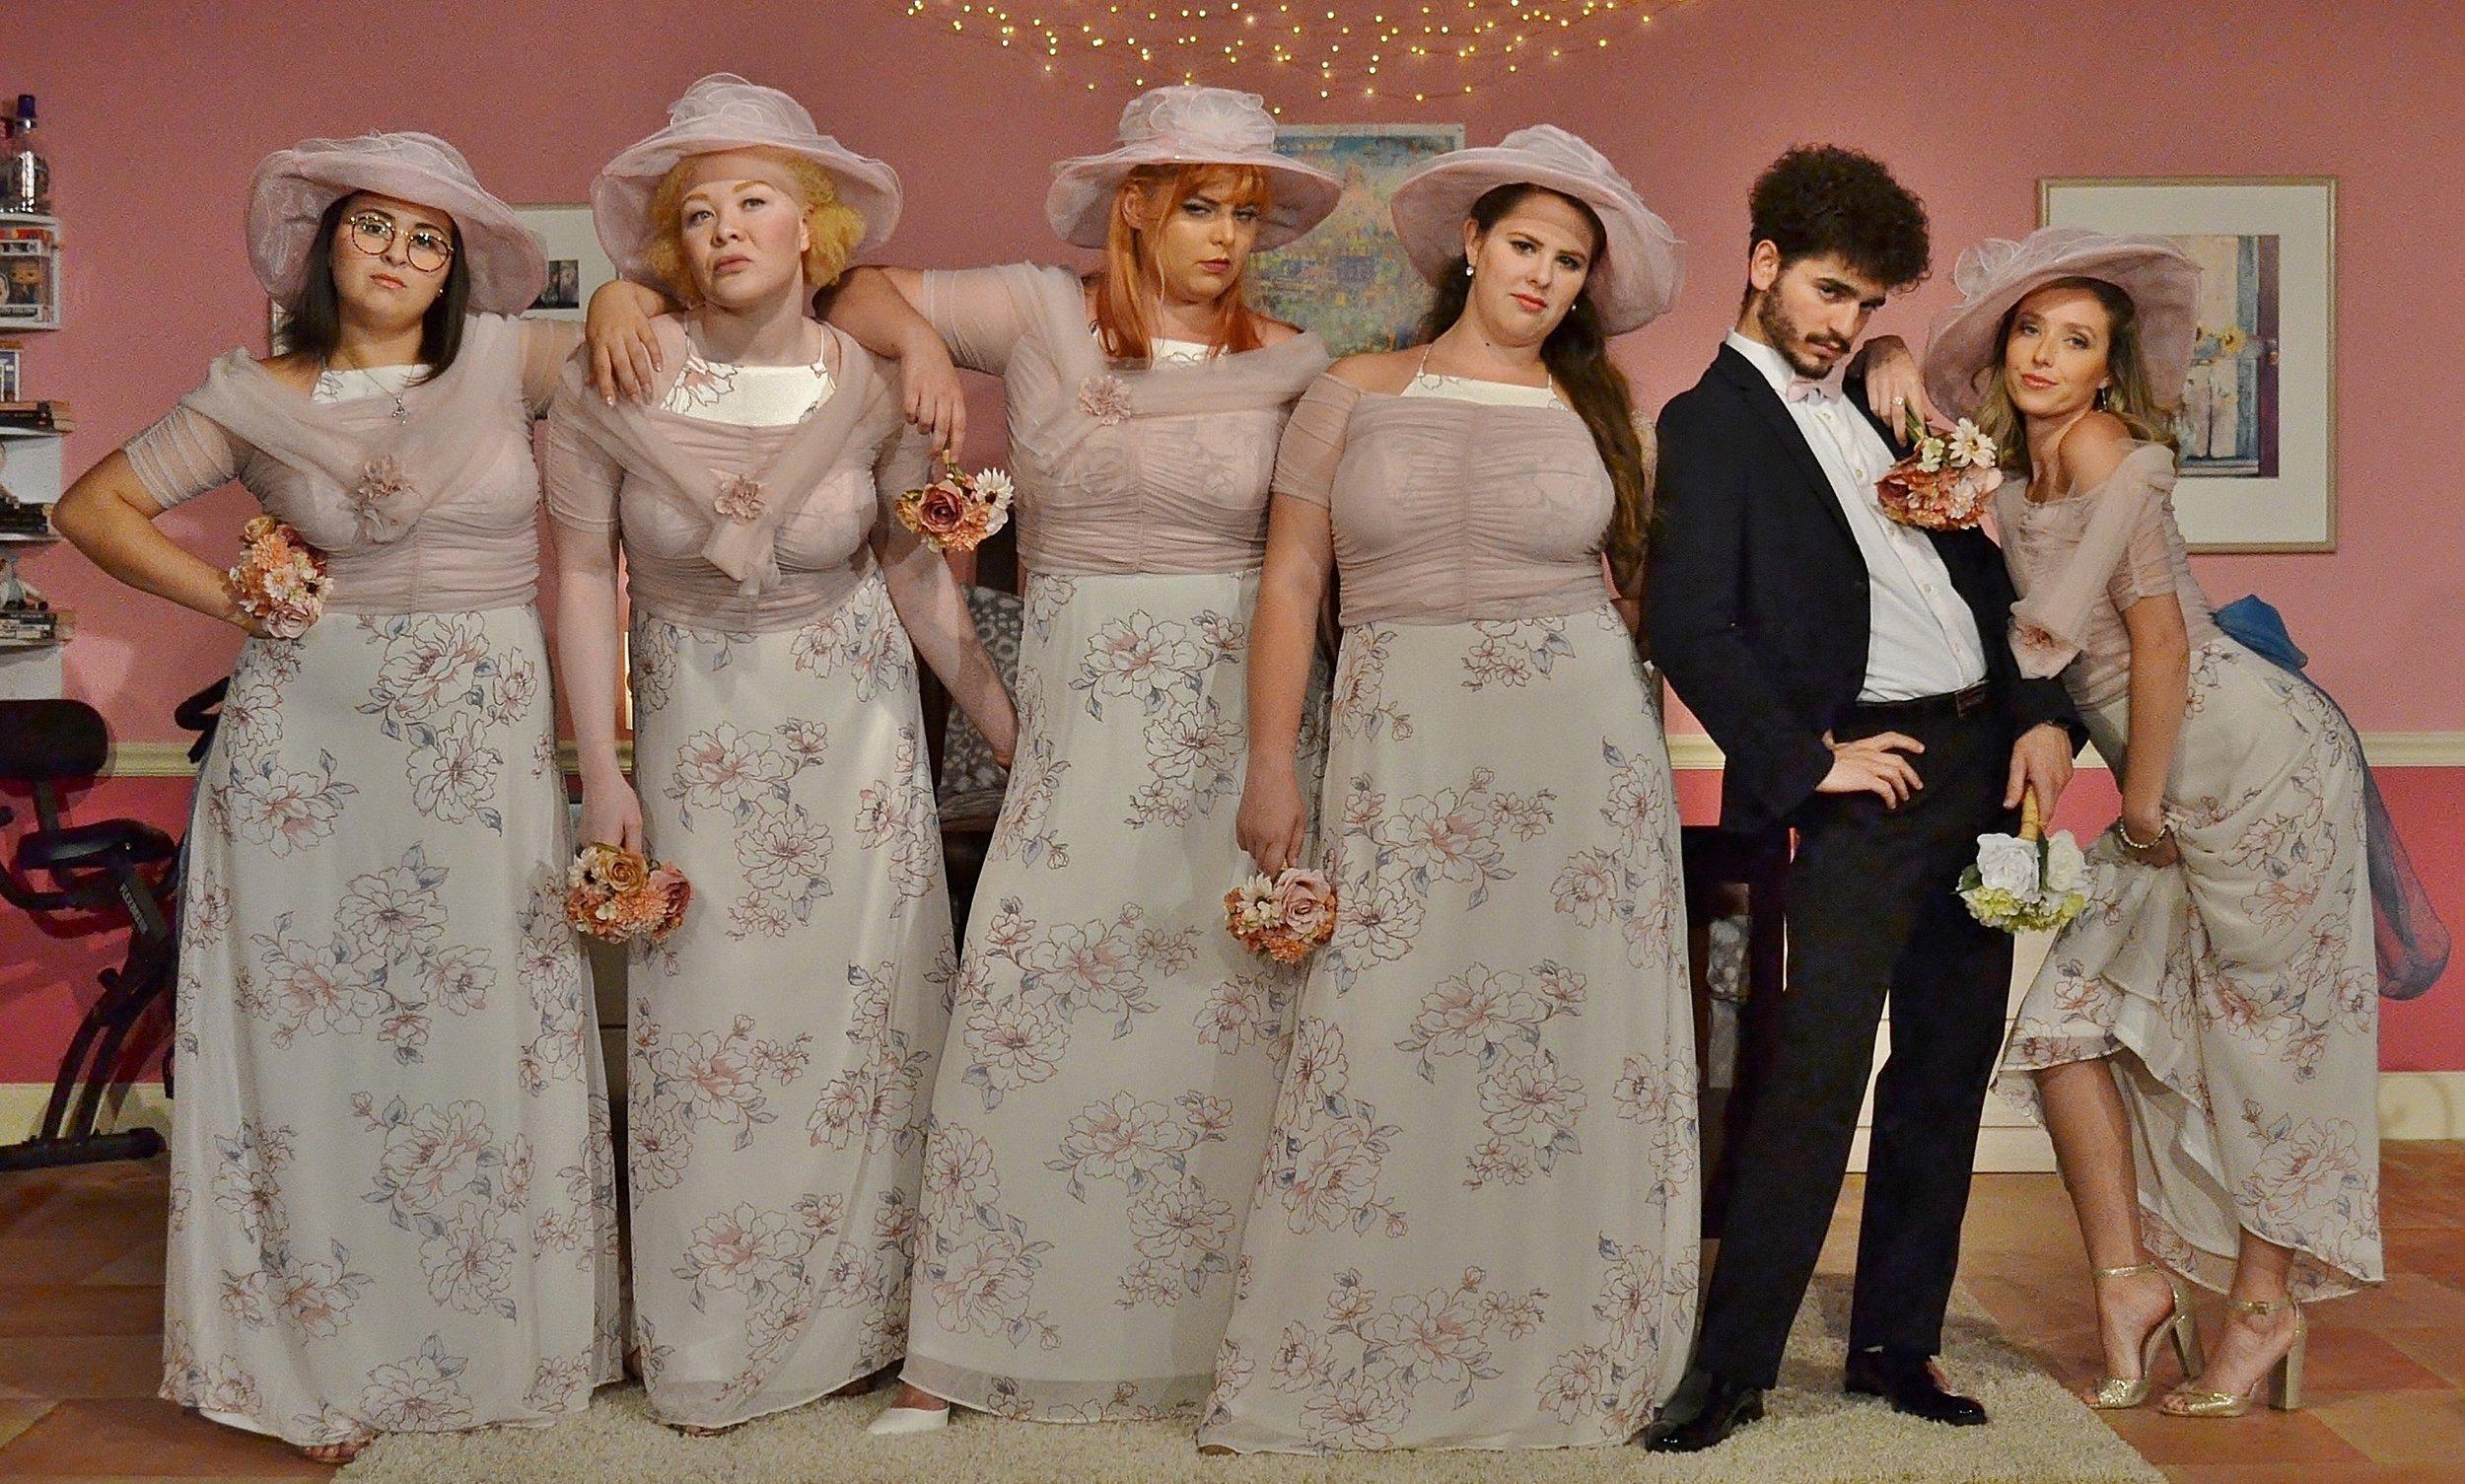 Five Women Wearing the Same Dress / July 2018